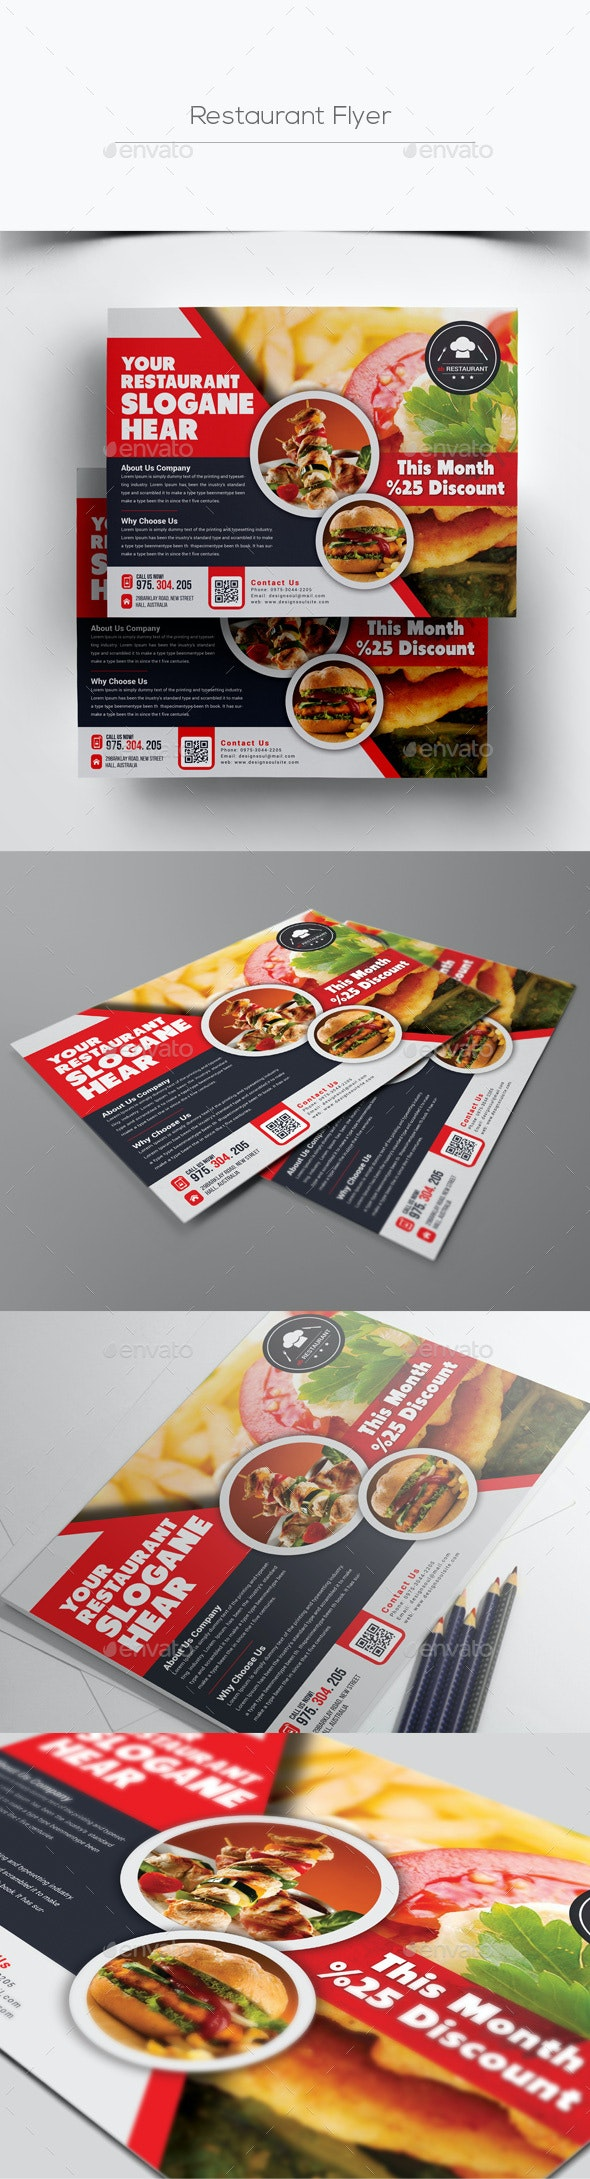 Horizontal Restaurant Flyer - Restaurant Flyers